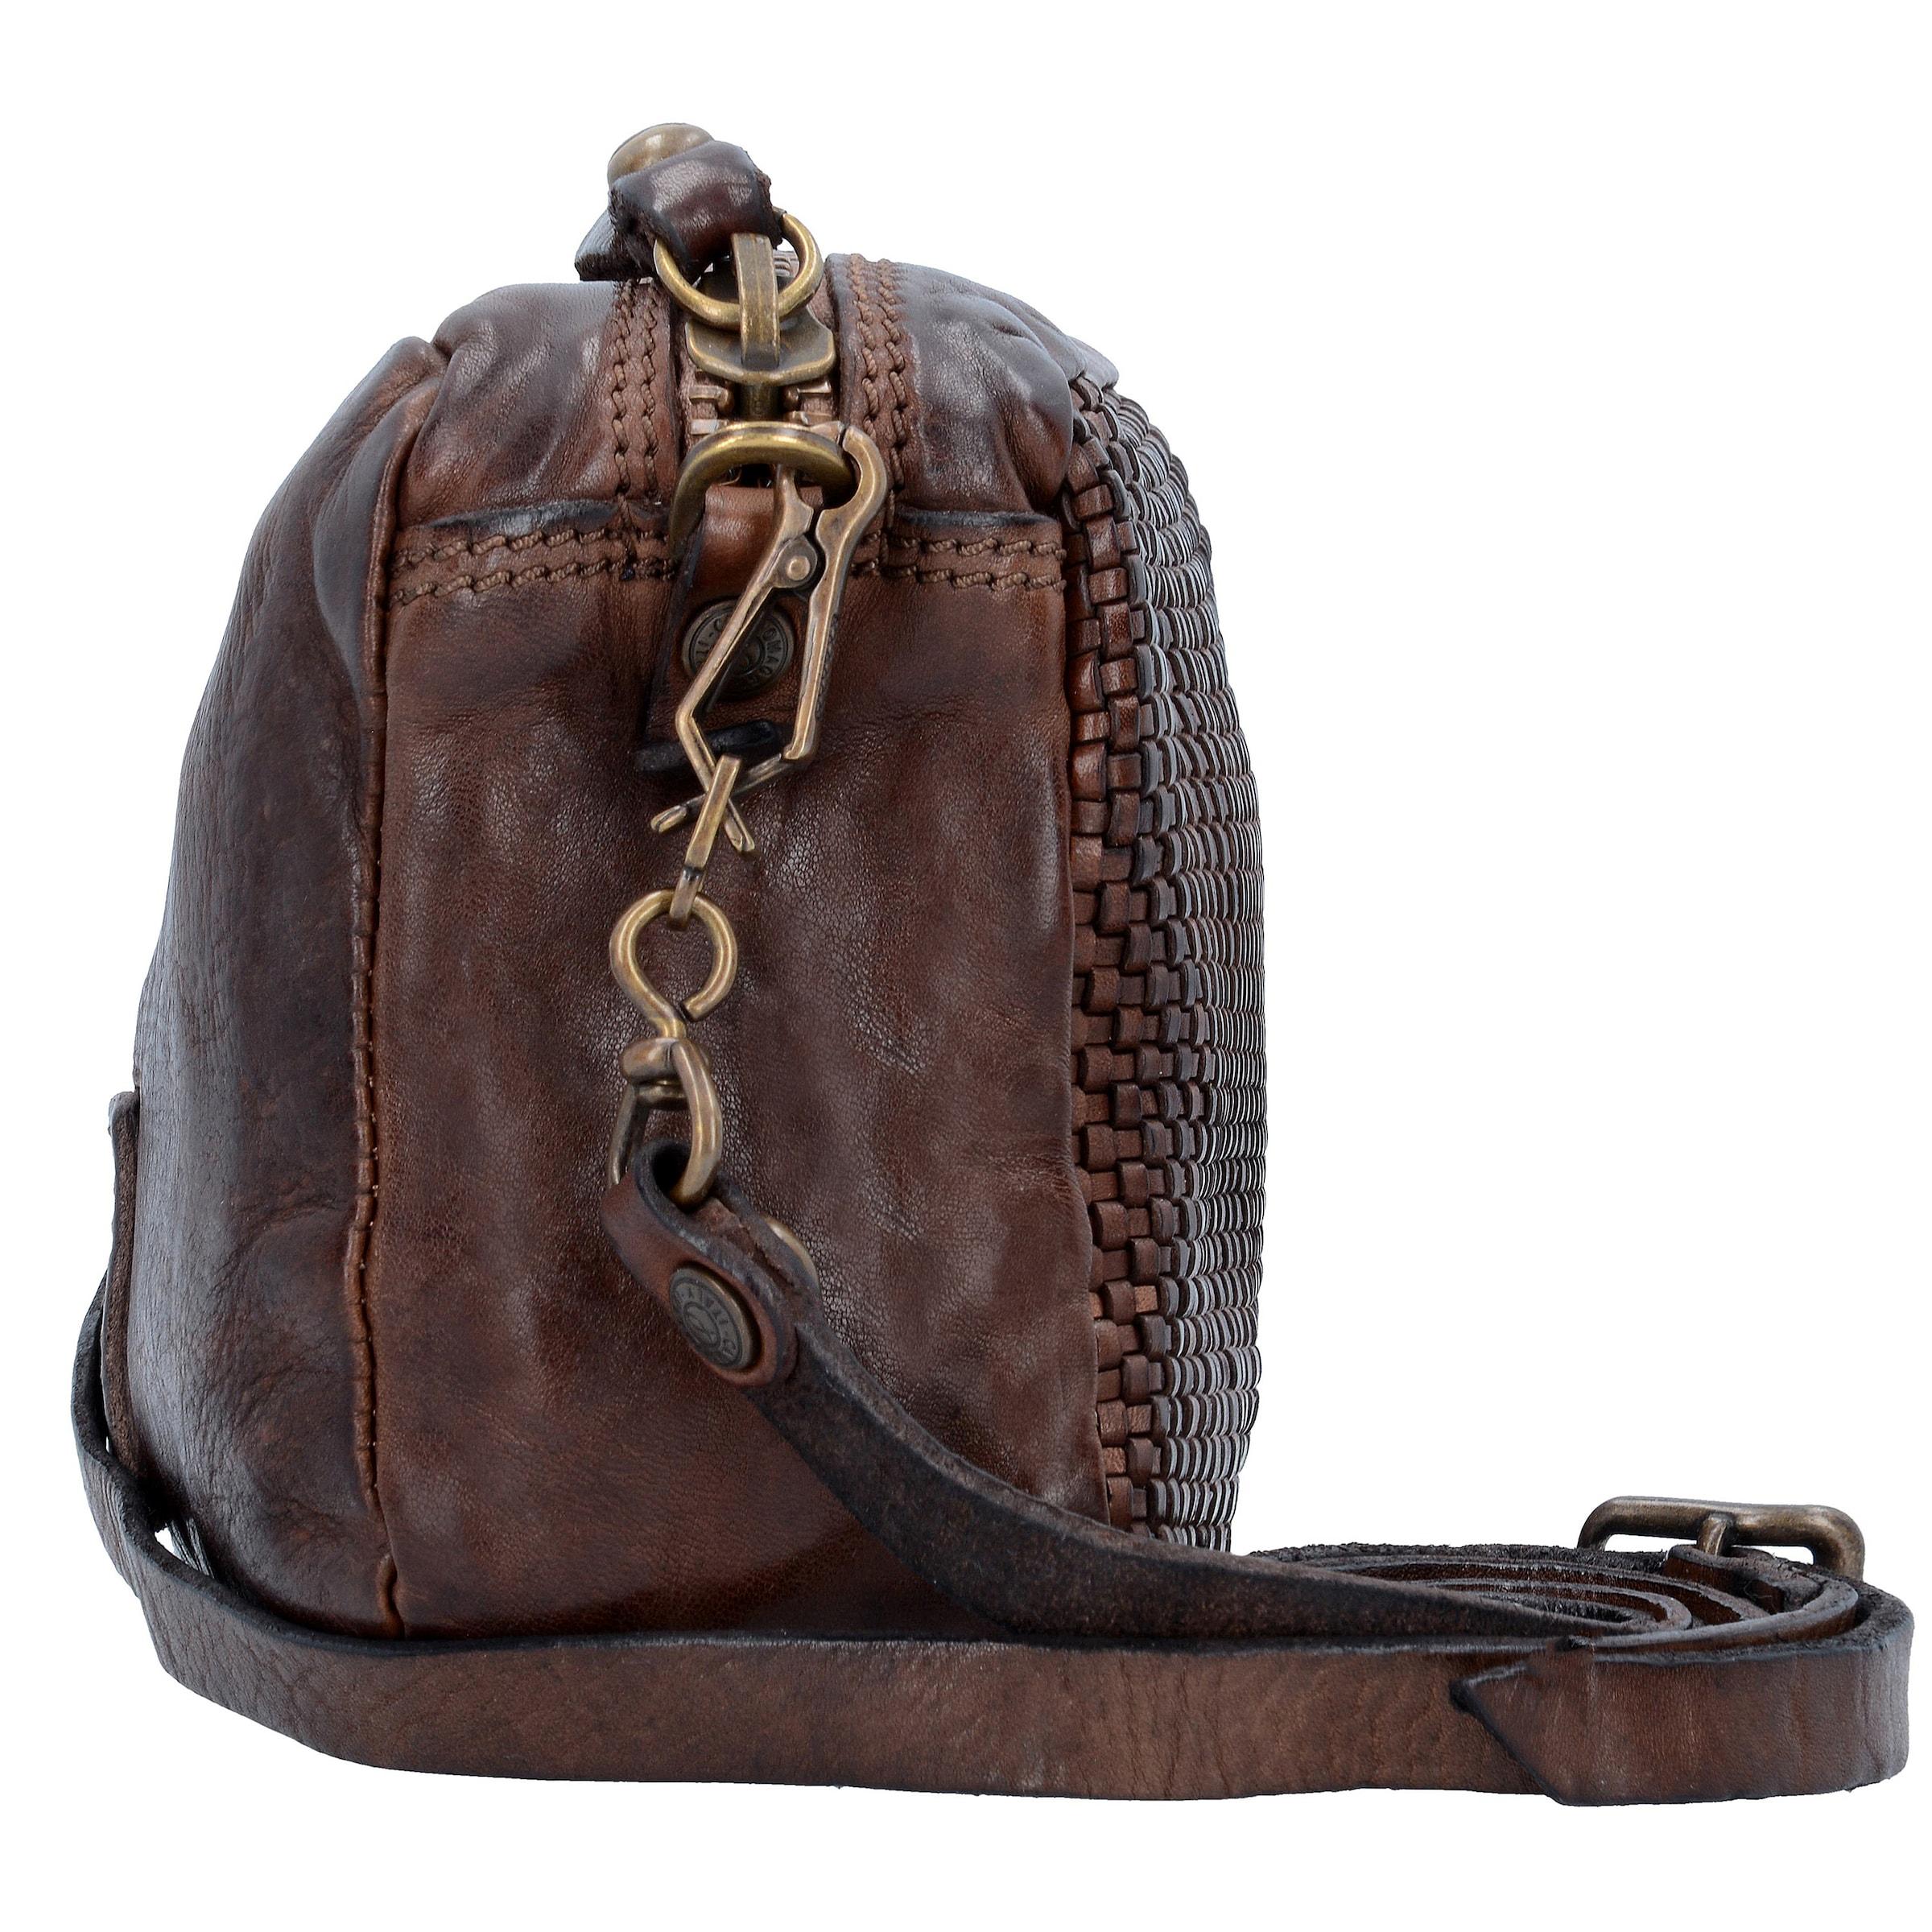 Leder Mini Prestige Bag 20 cm Edera Bag Campomaggi Edera Campomaggi Mini Prestige Schultertasche XqxwZvtZp